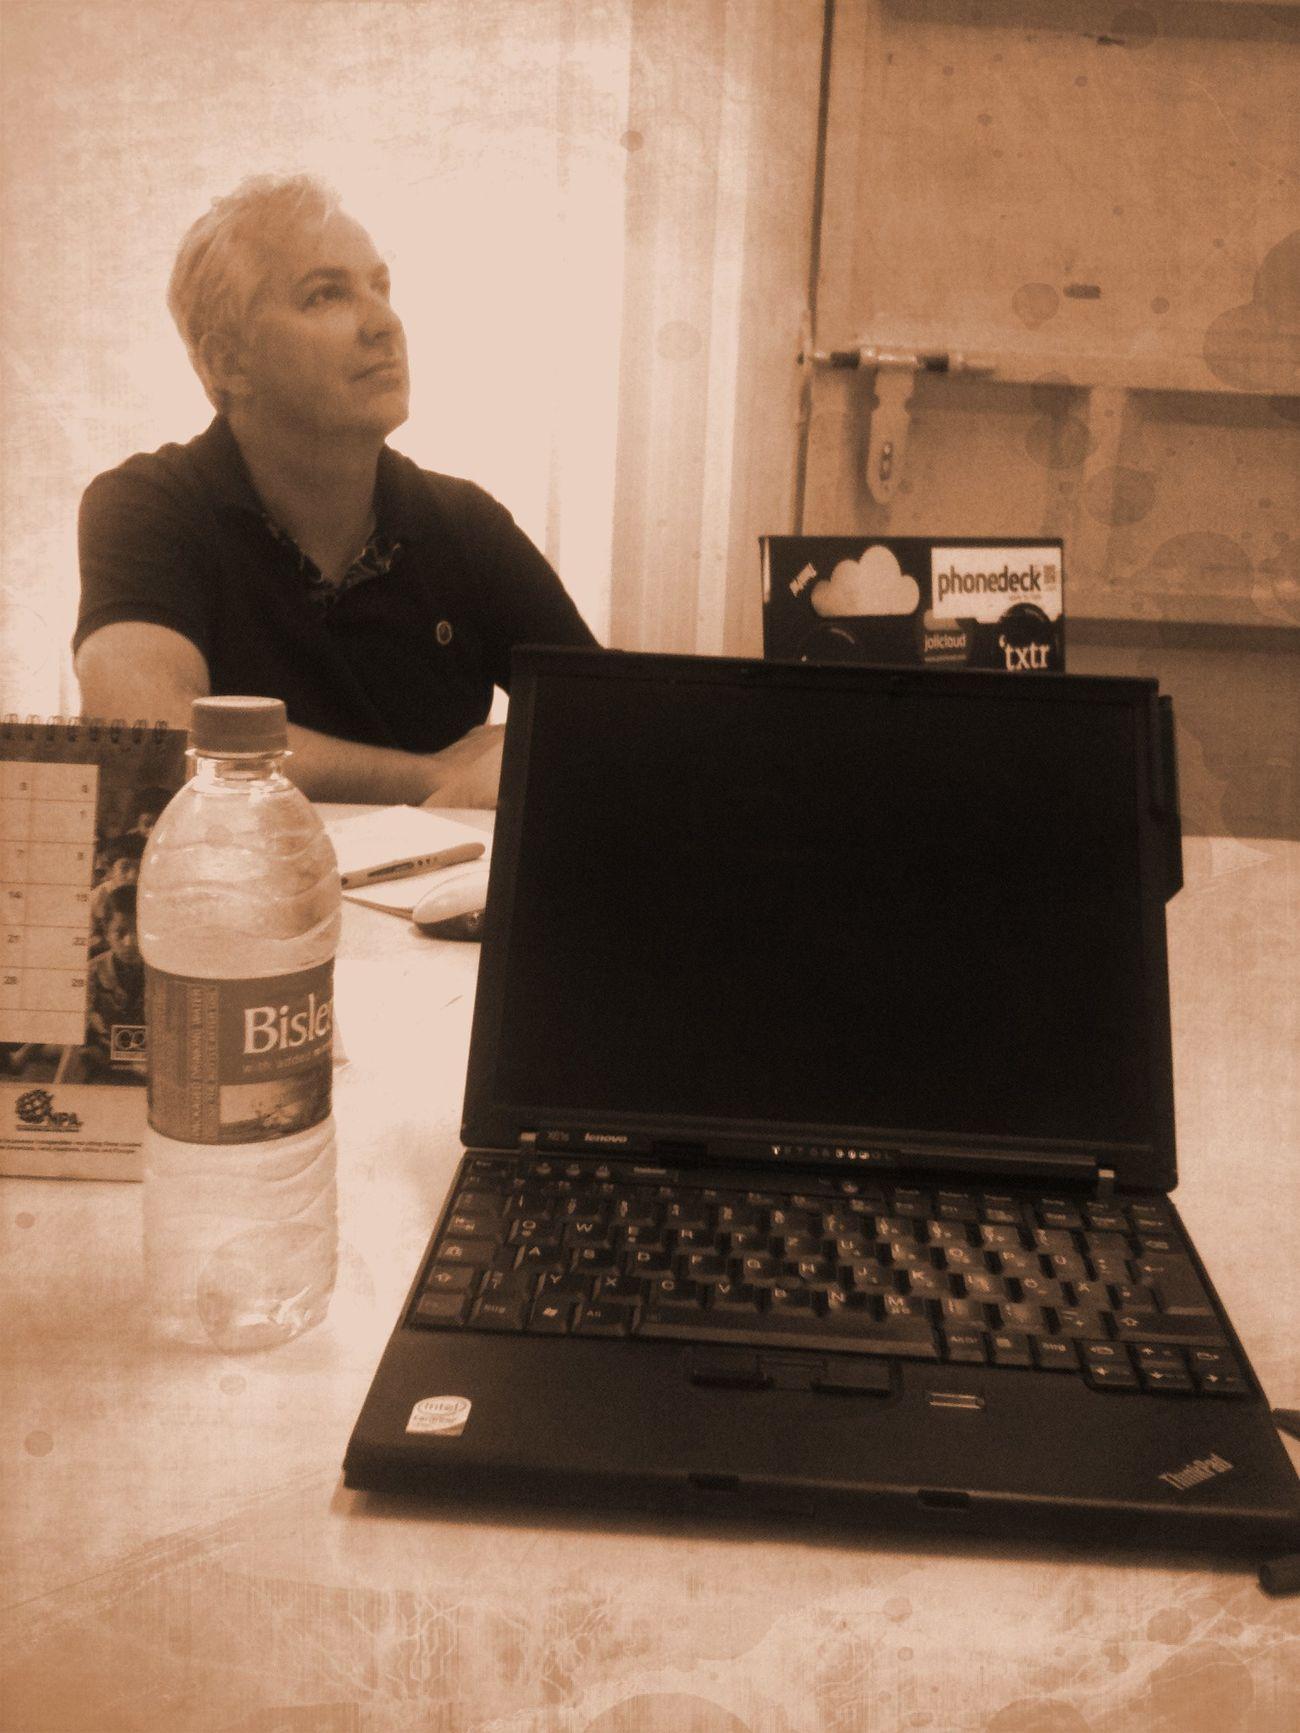 Meeting at Toostep Office Meeting